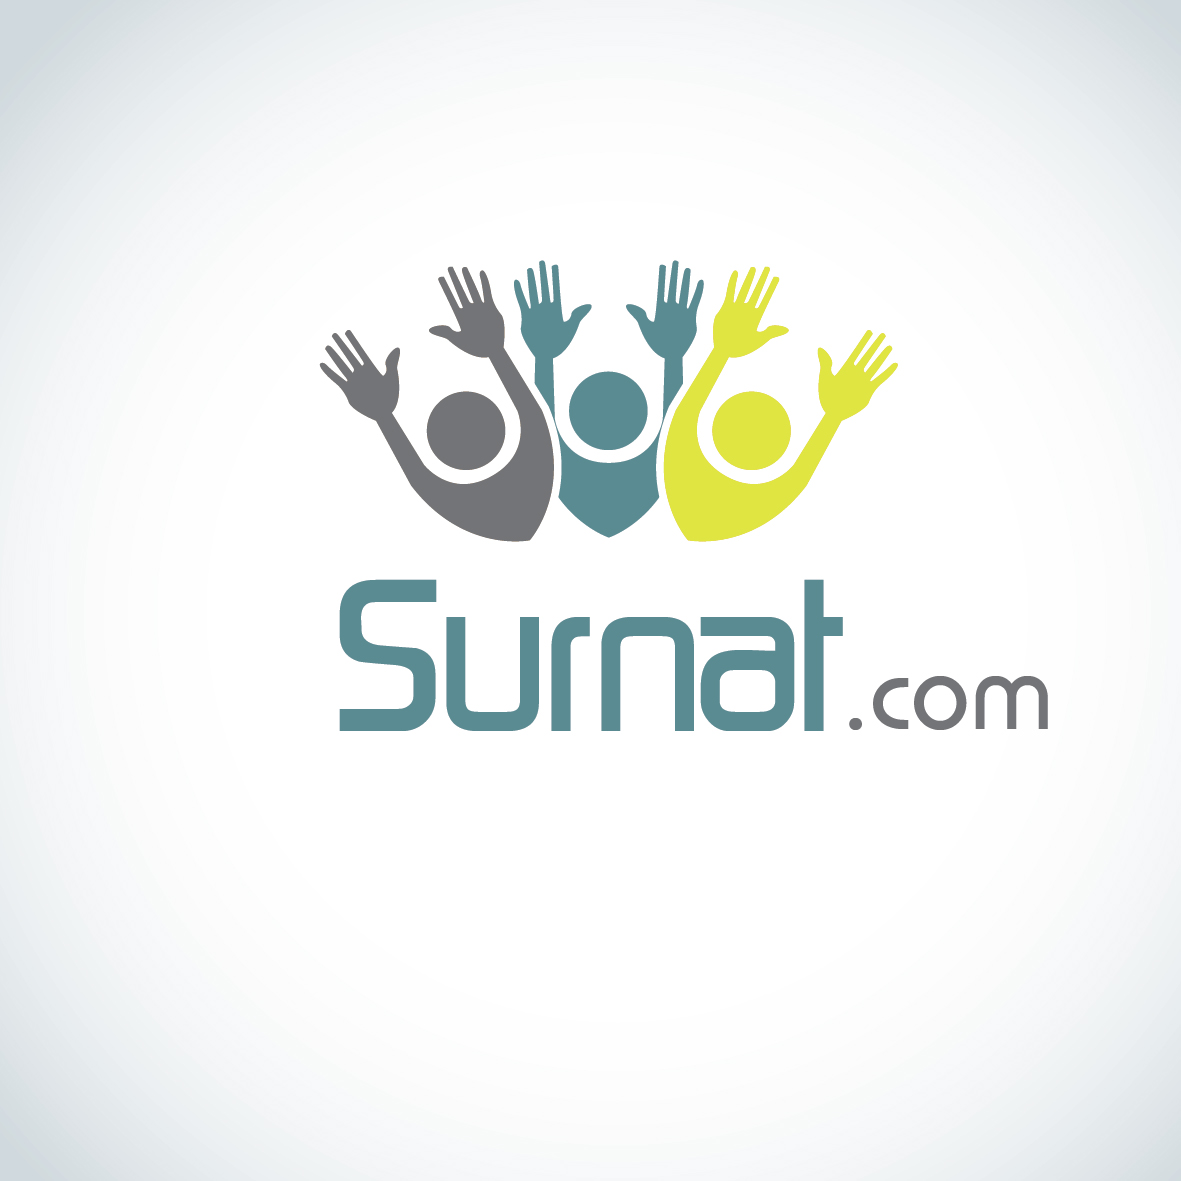 Logo Design by aesthetic-art - Entry No. 46 in the Logo Design Contest Surnat.com.